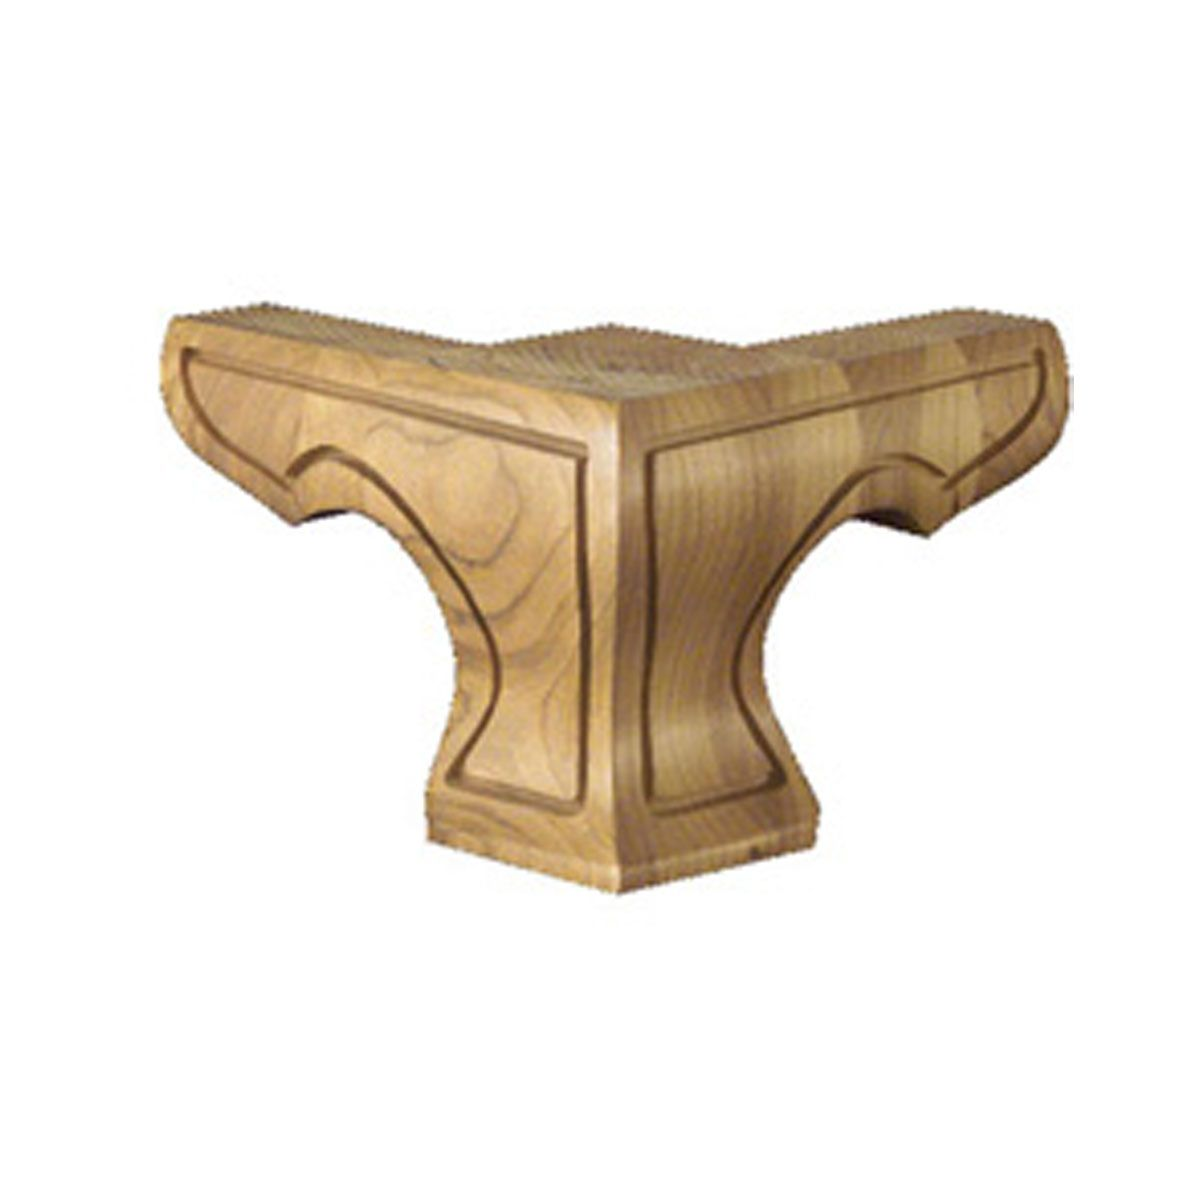 wood feet for furniture